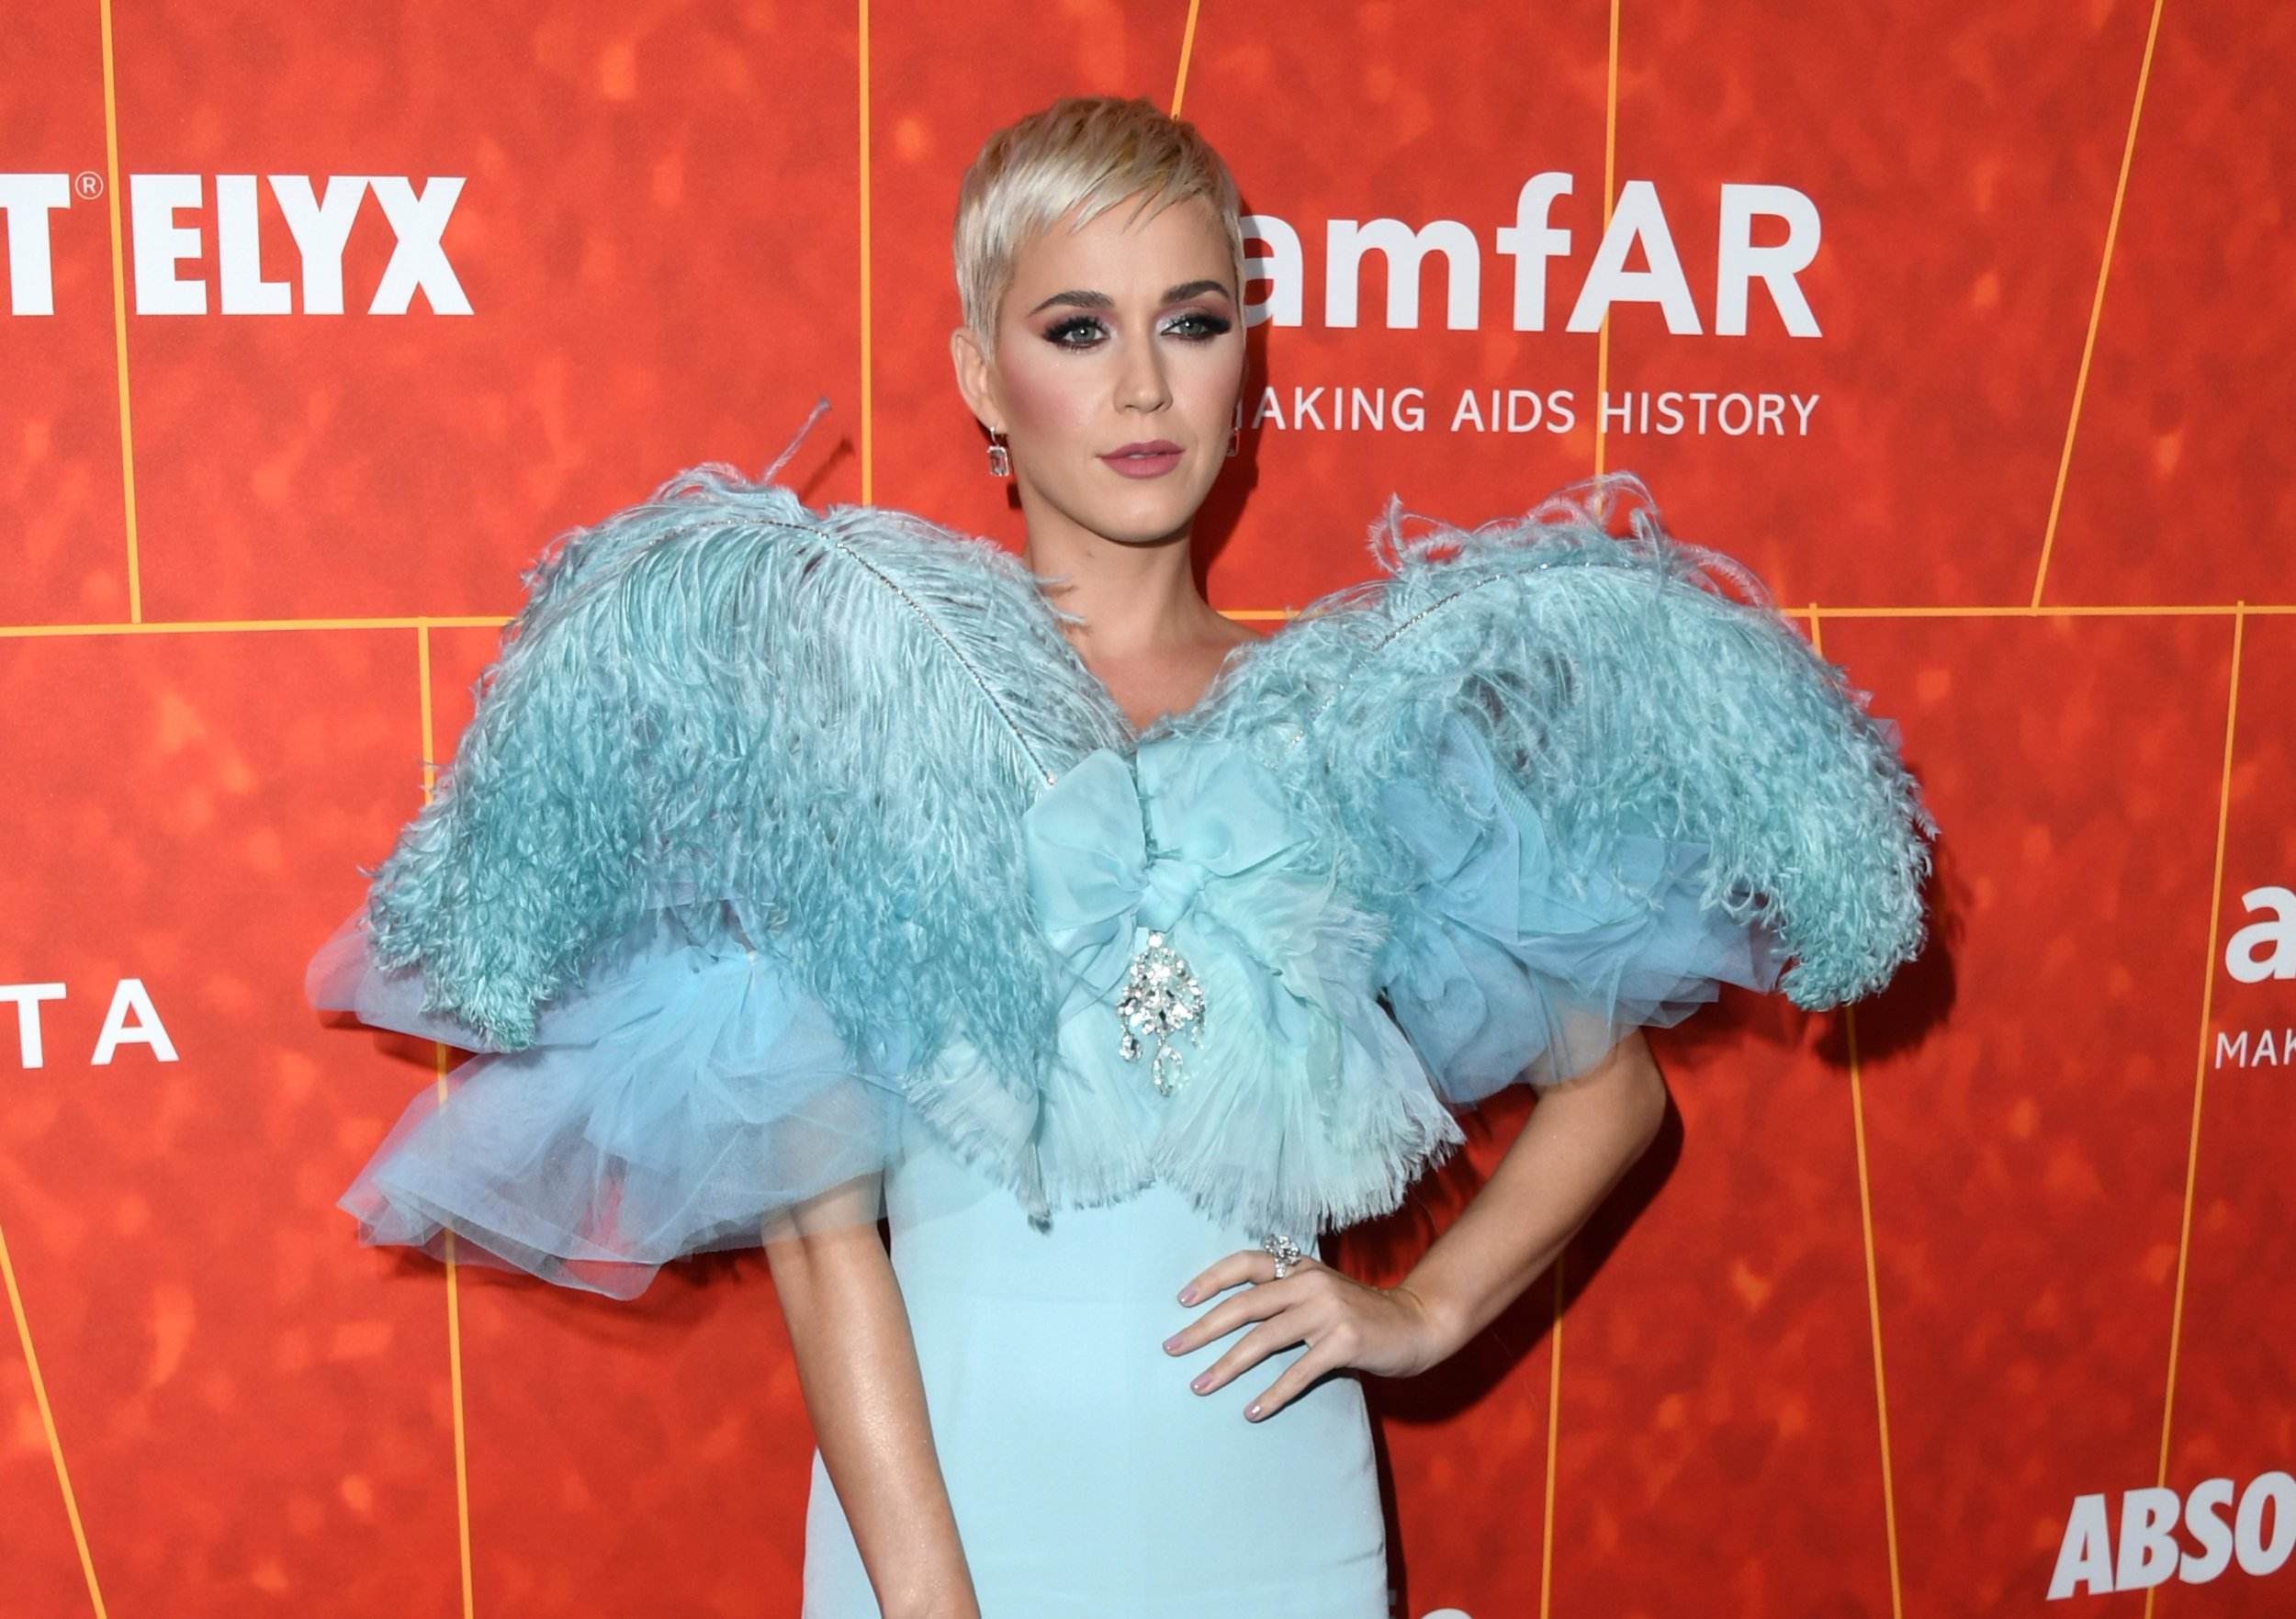 Katy Perry Testimony Revealed